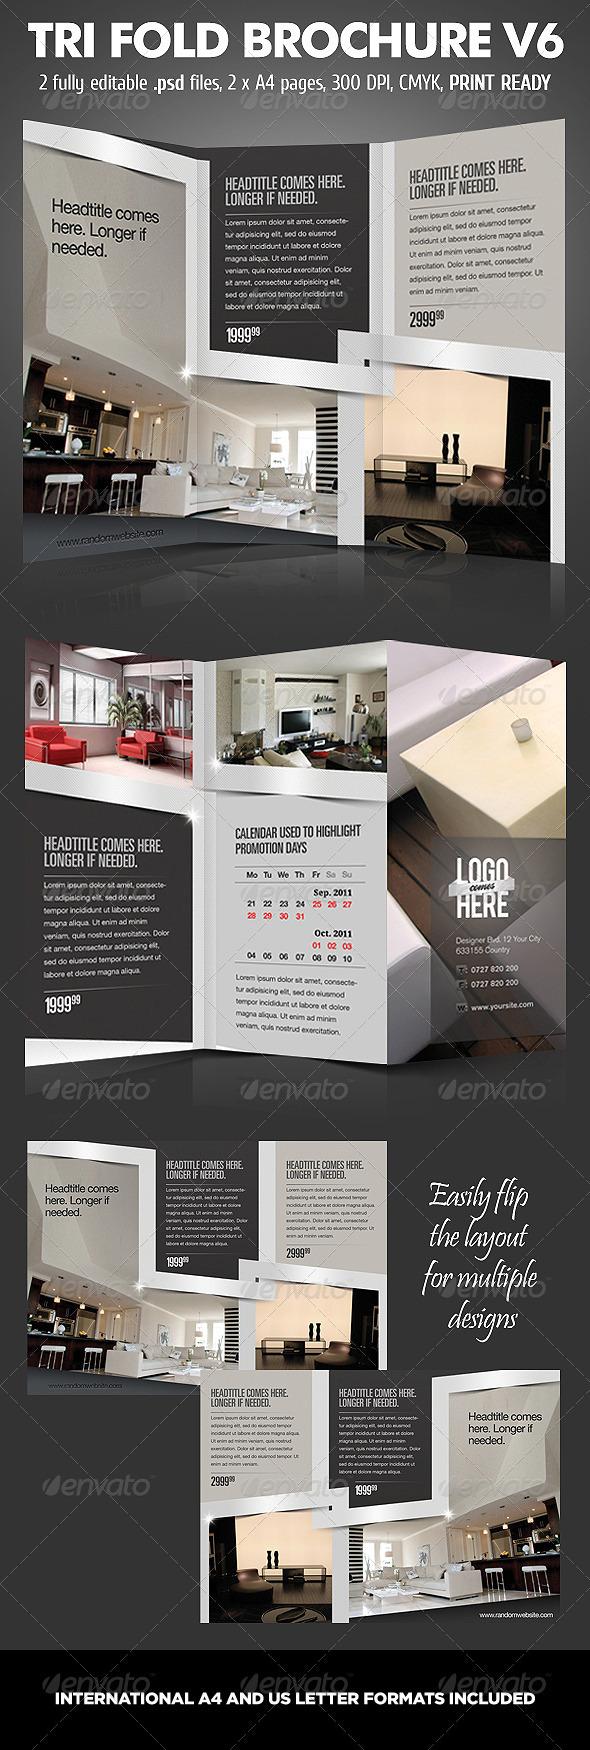 TriFold Brochure V6 | GraphicRiver